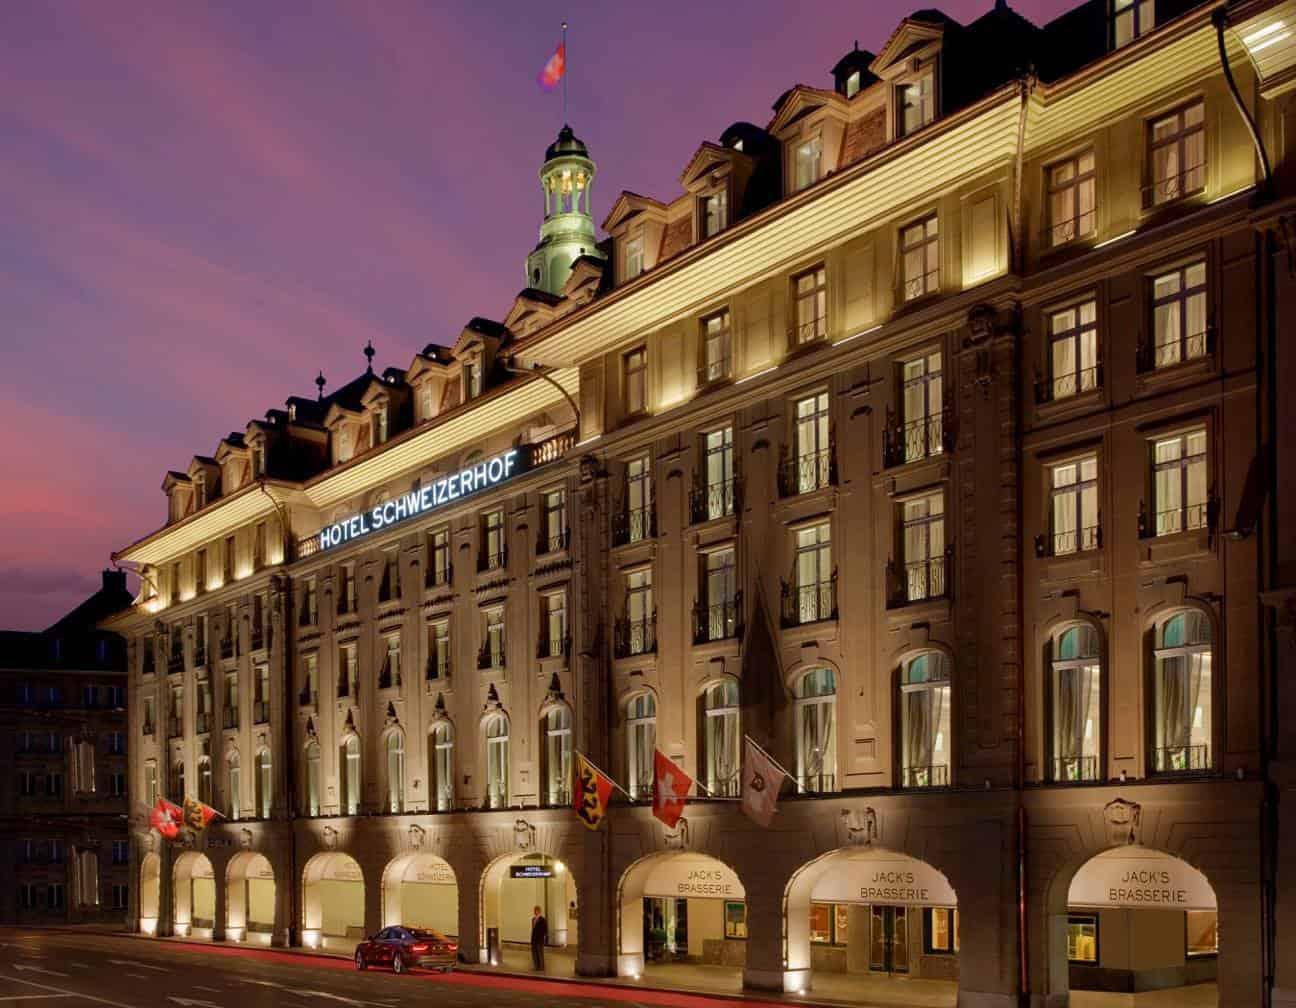 Hotel Schweizerhof Bern - Luxury Hotel of the Year